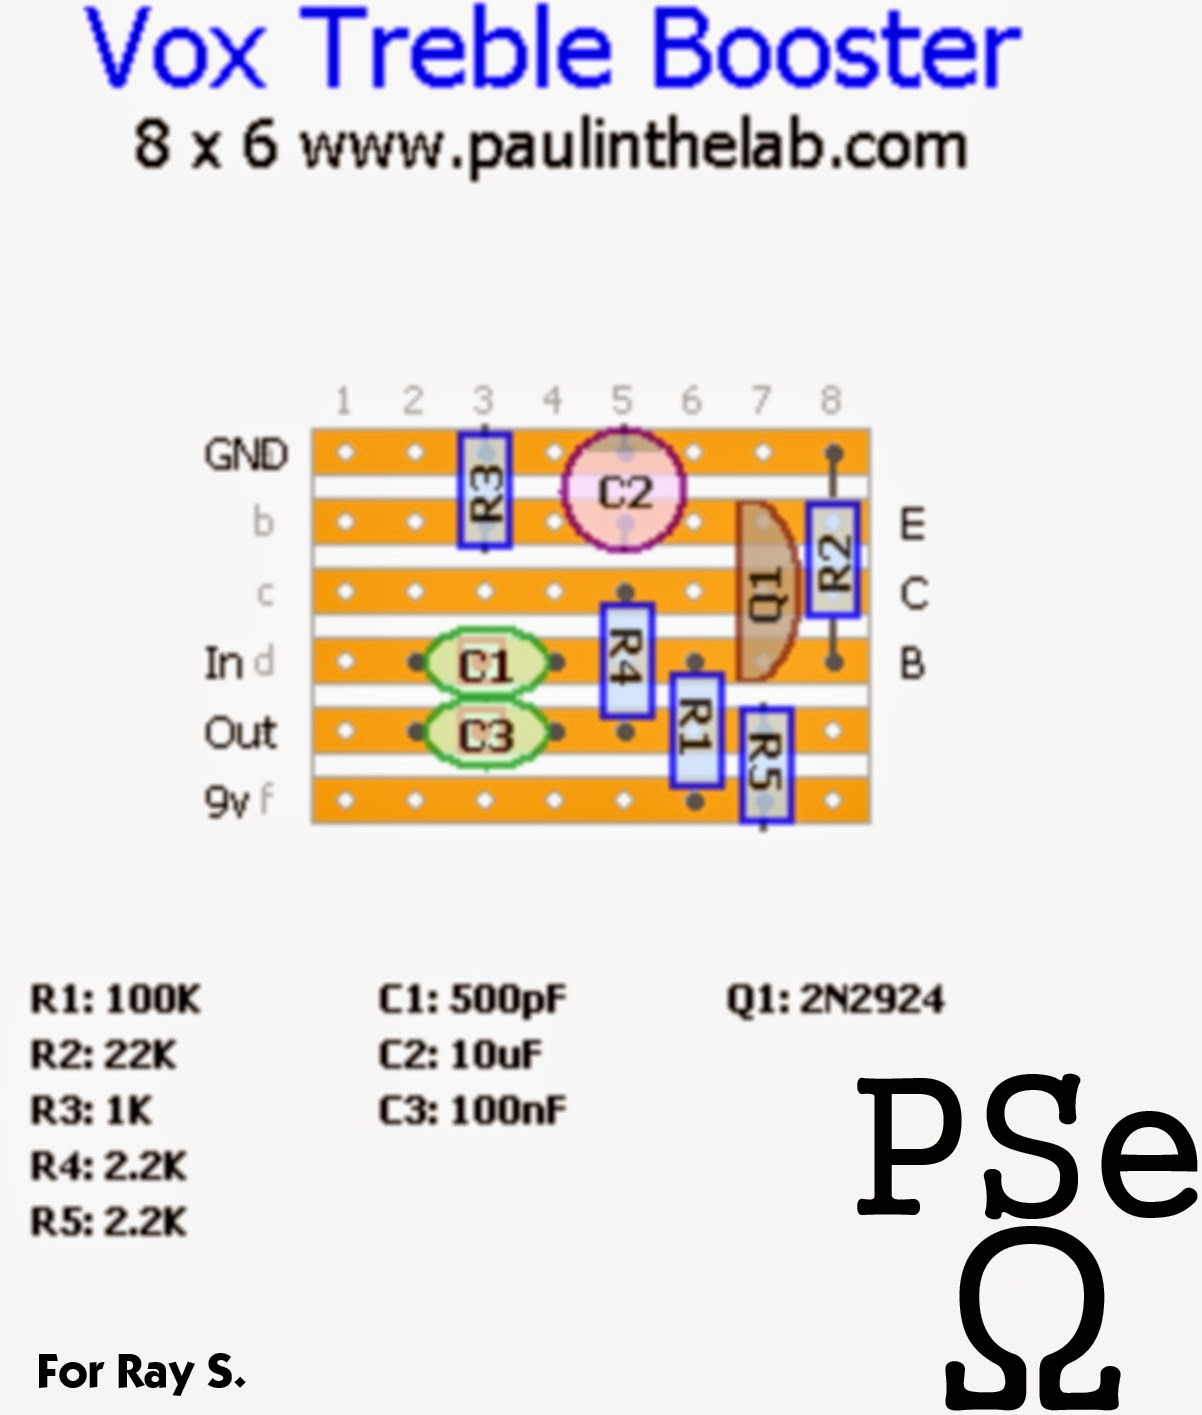 paul in the lab vox treble booster stripboard veroboard layout rh paulinthelab blogspot com vox v 806 treble booster vox treble booster circuit